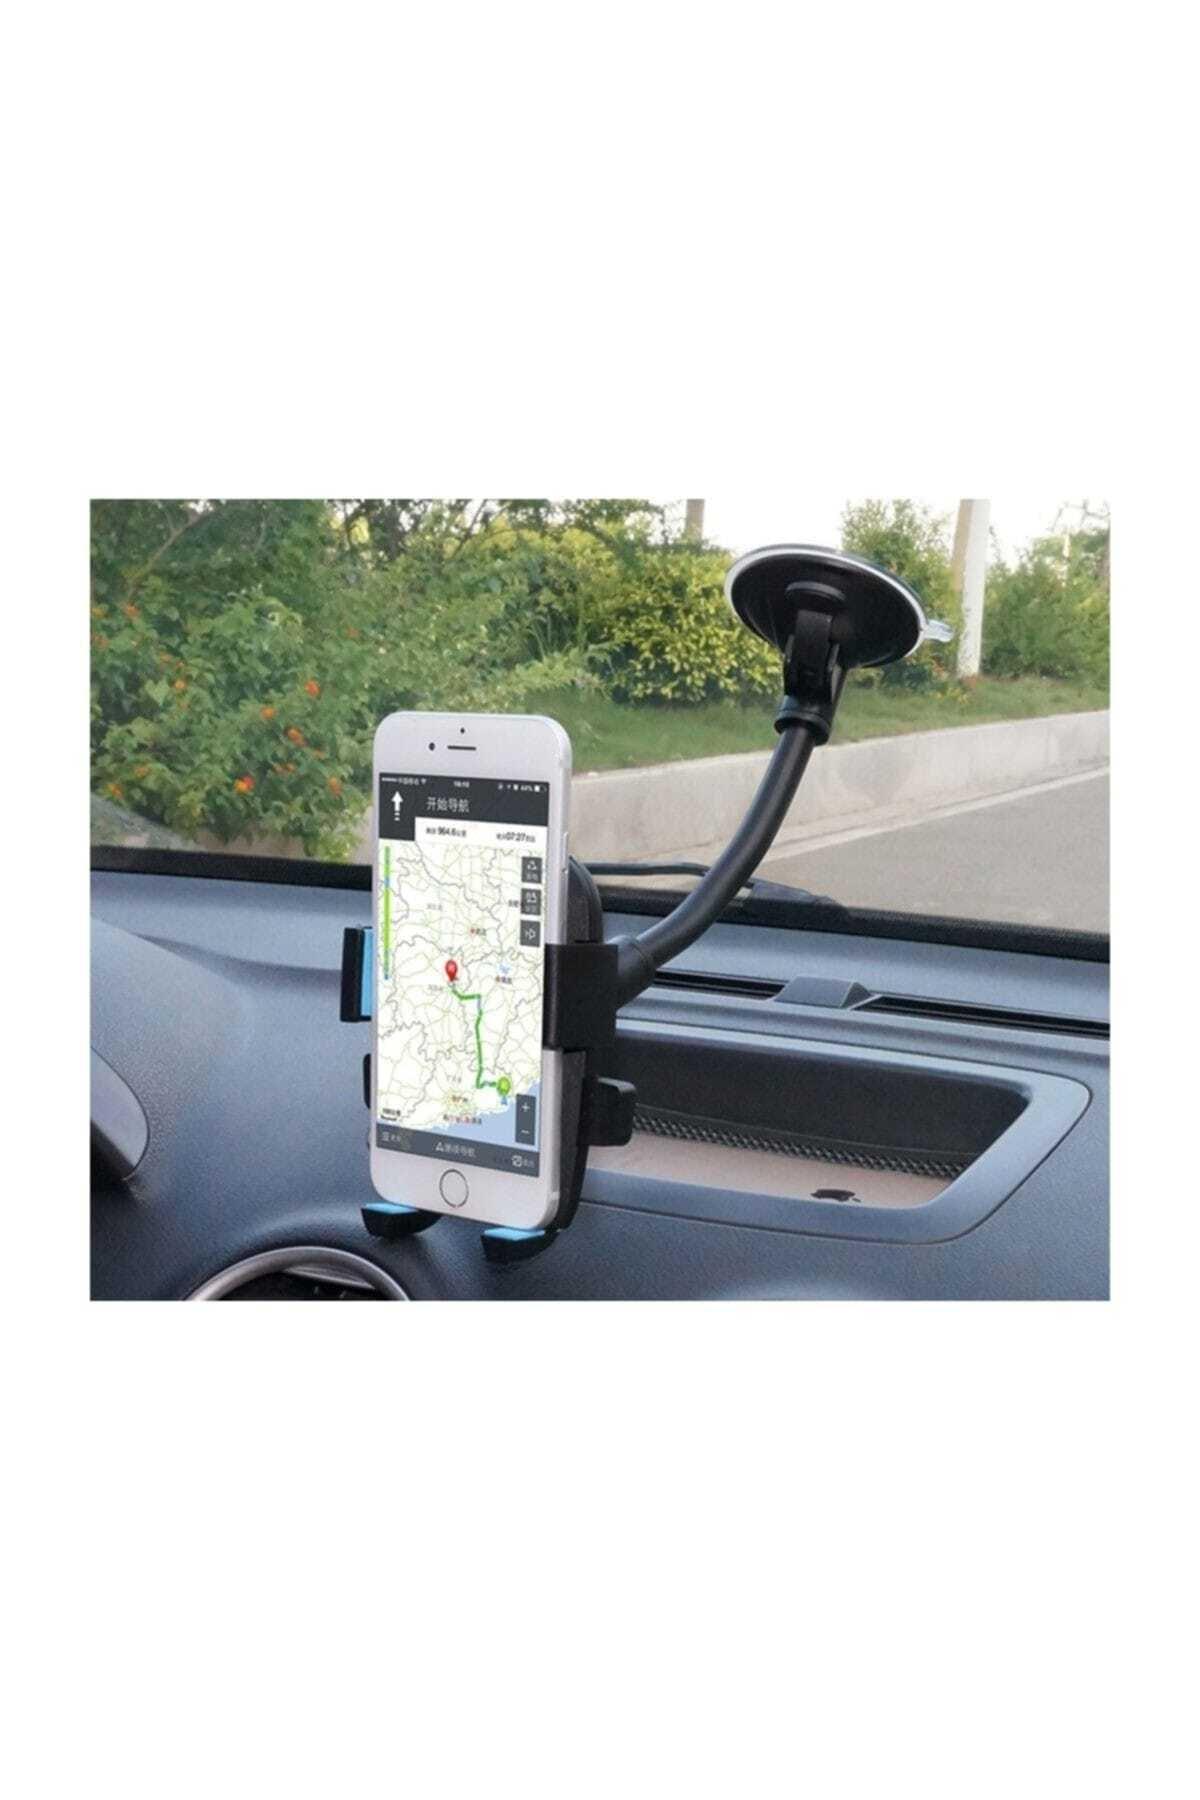 LETANG Xx- Araç Içi Vakumlu Üniversal Telefon Navigasyon Tutucu 1